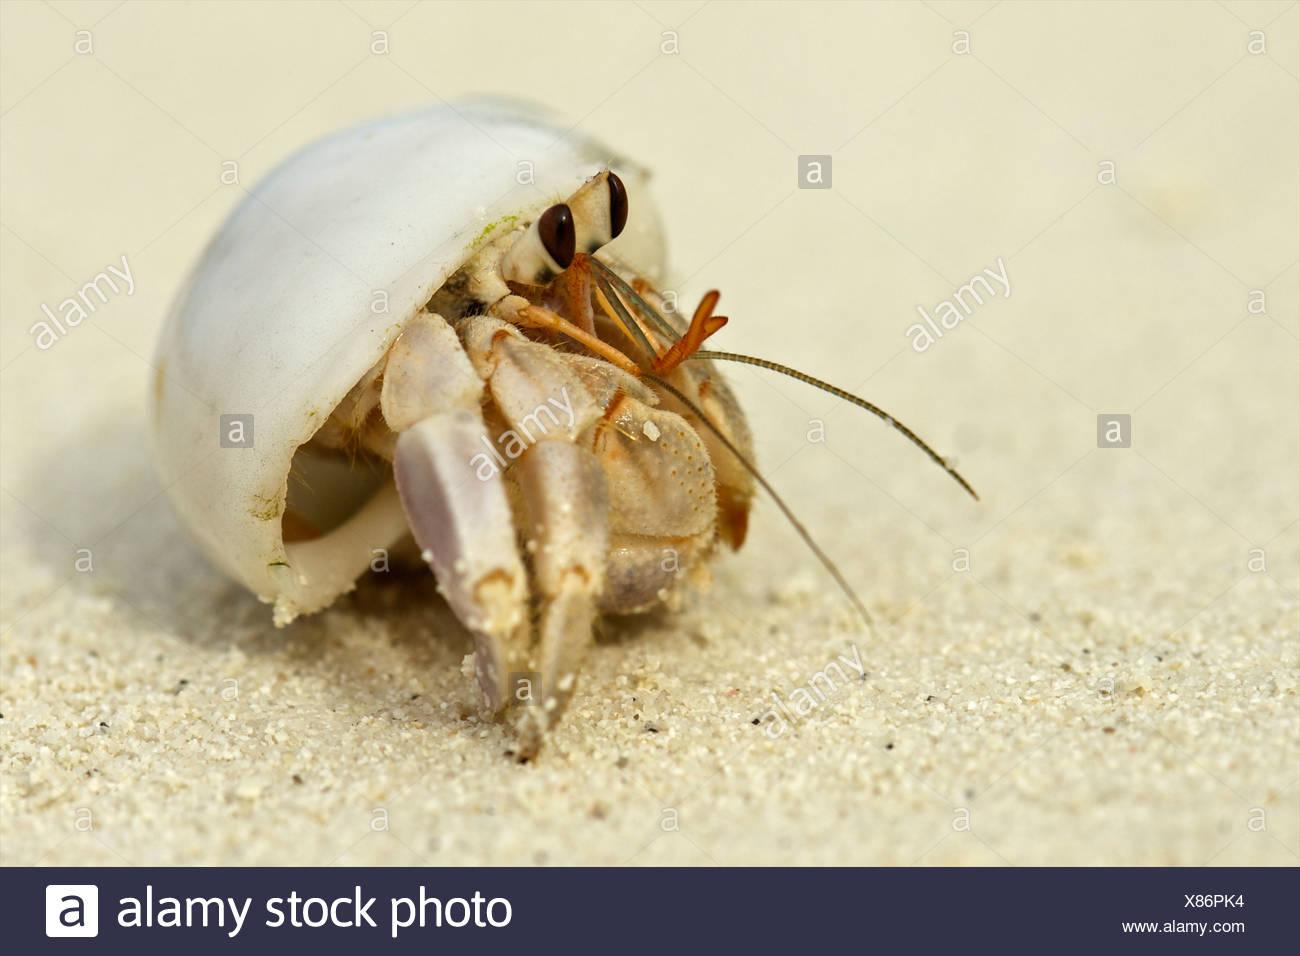 Cangrejo ermitaño en un shell, Maldivas Imagen De Stock